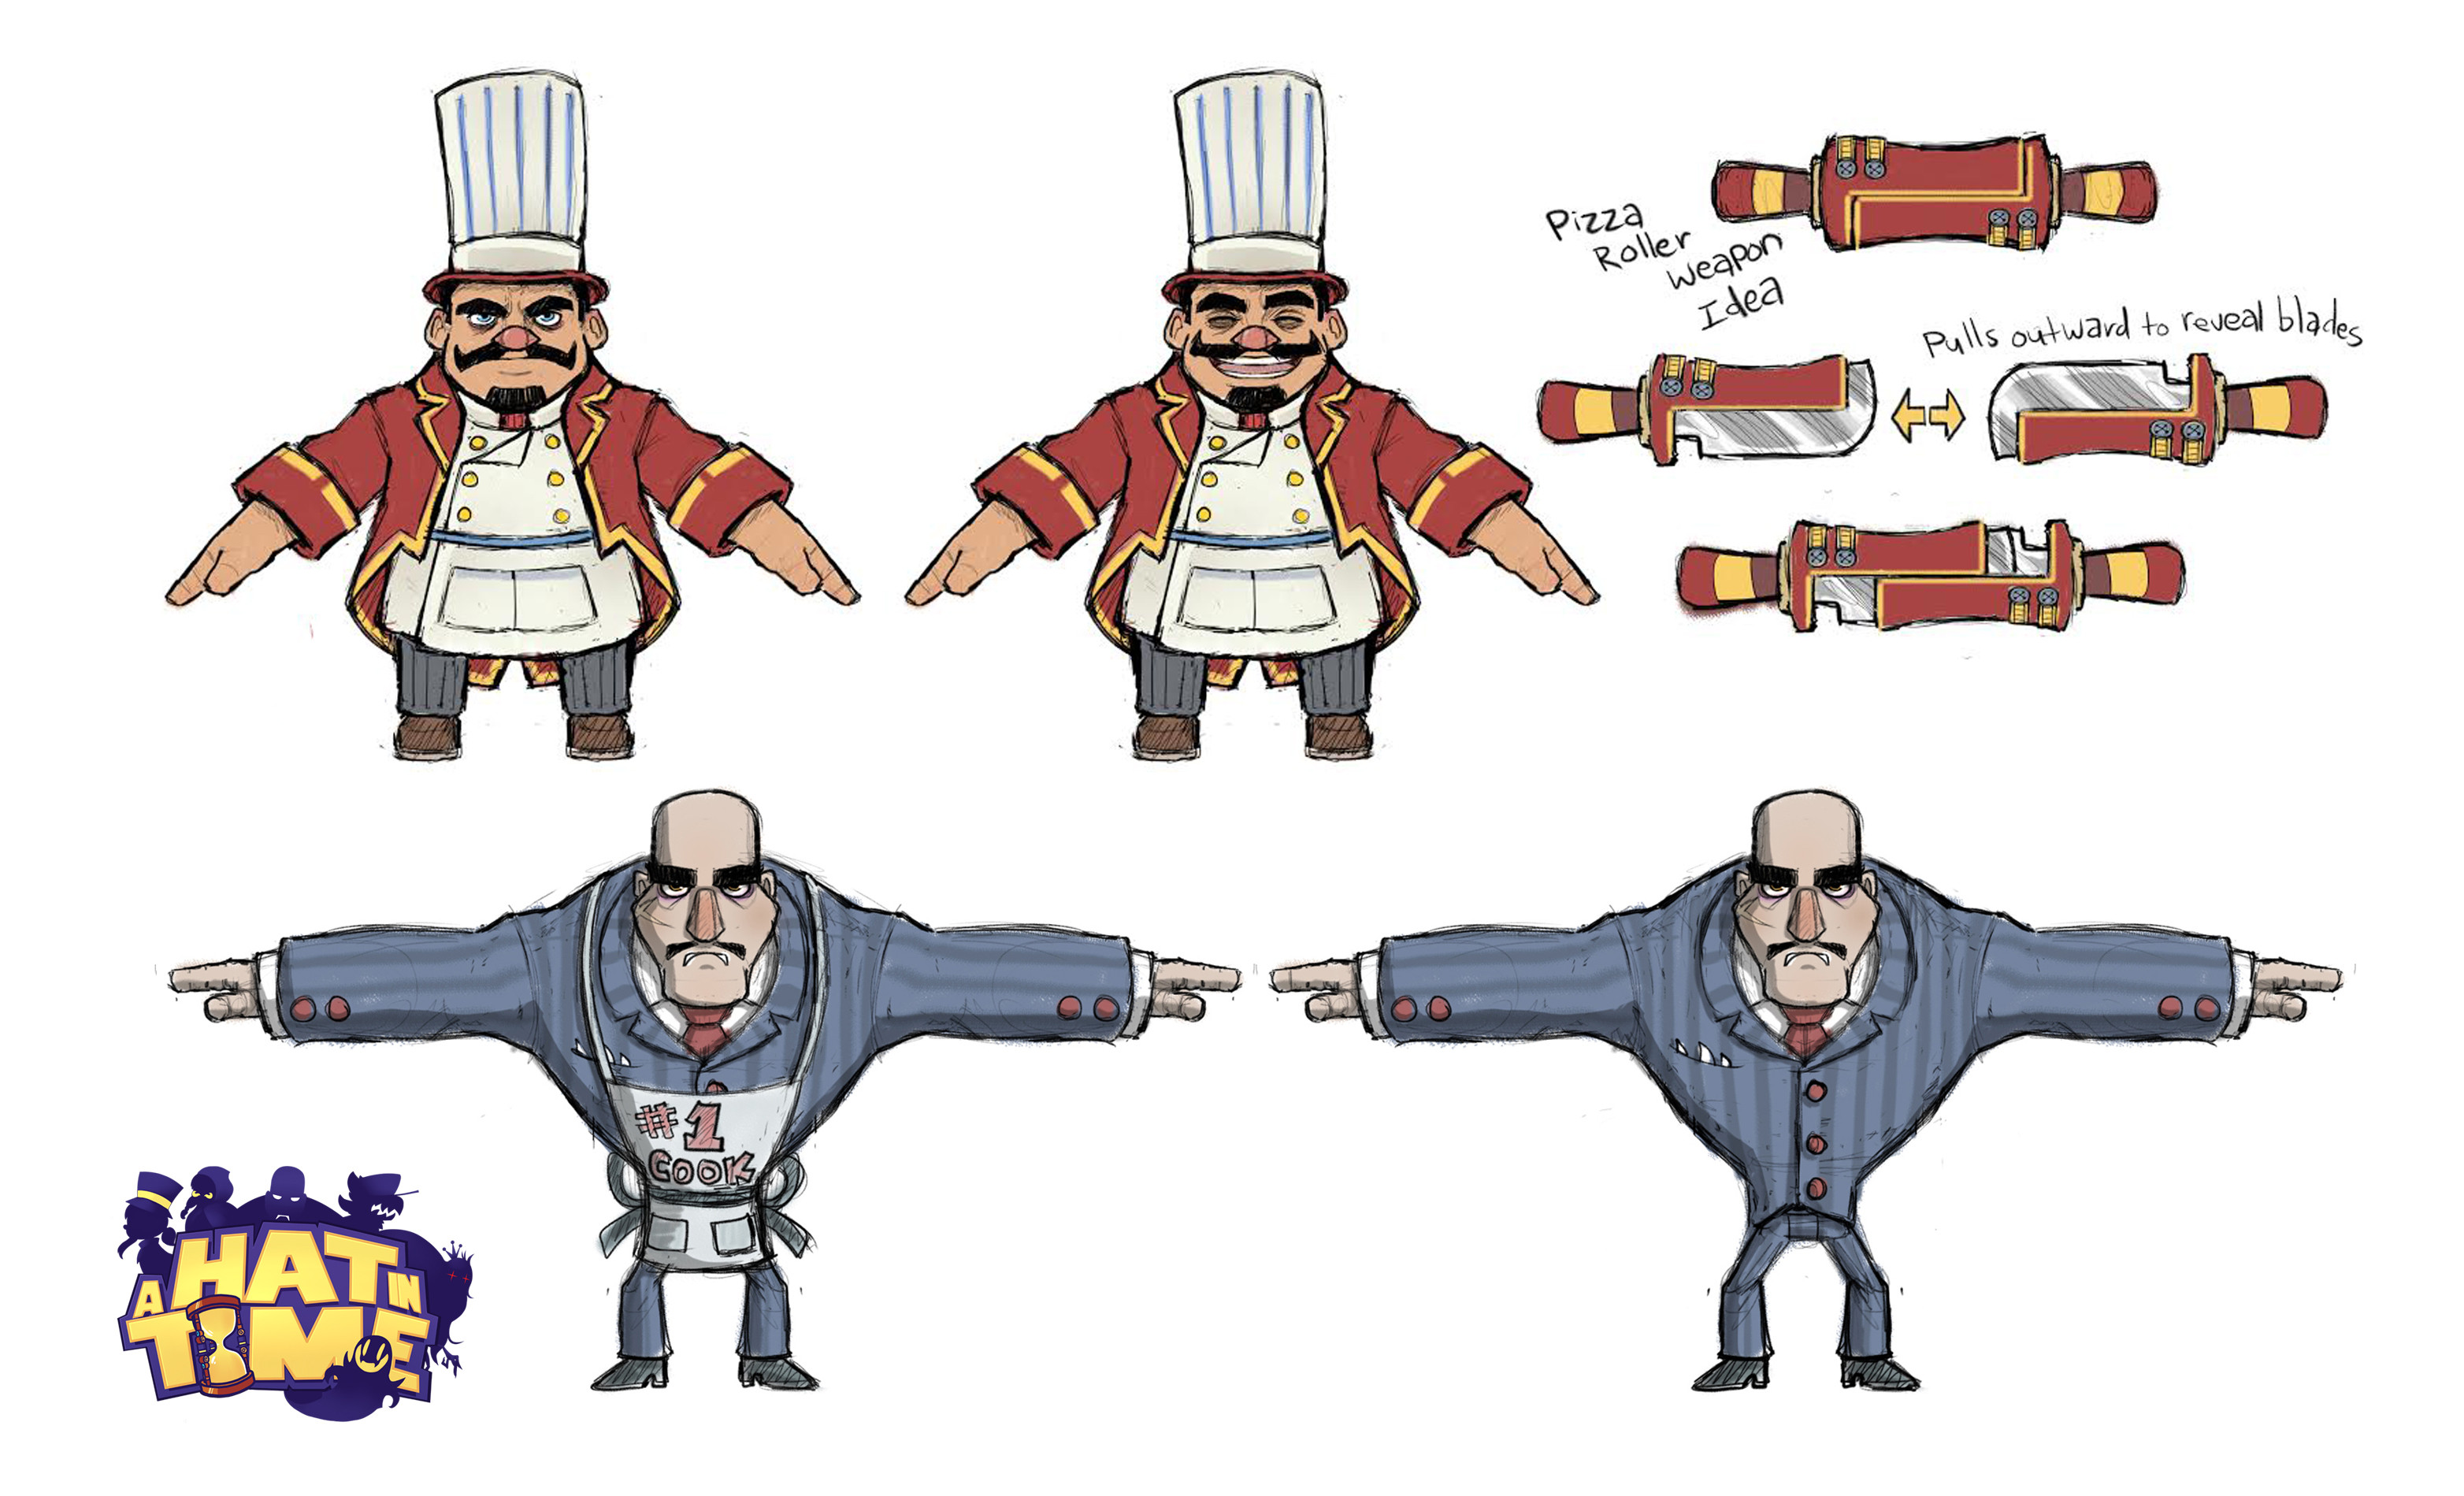 Mafia Boss and Goons Character Design